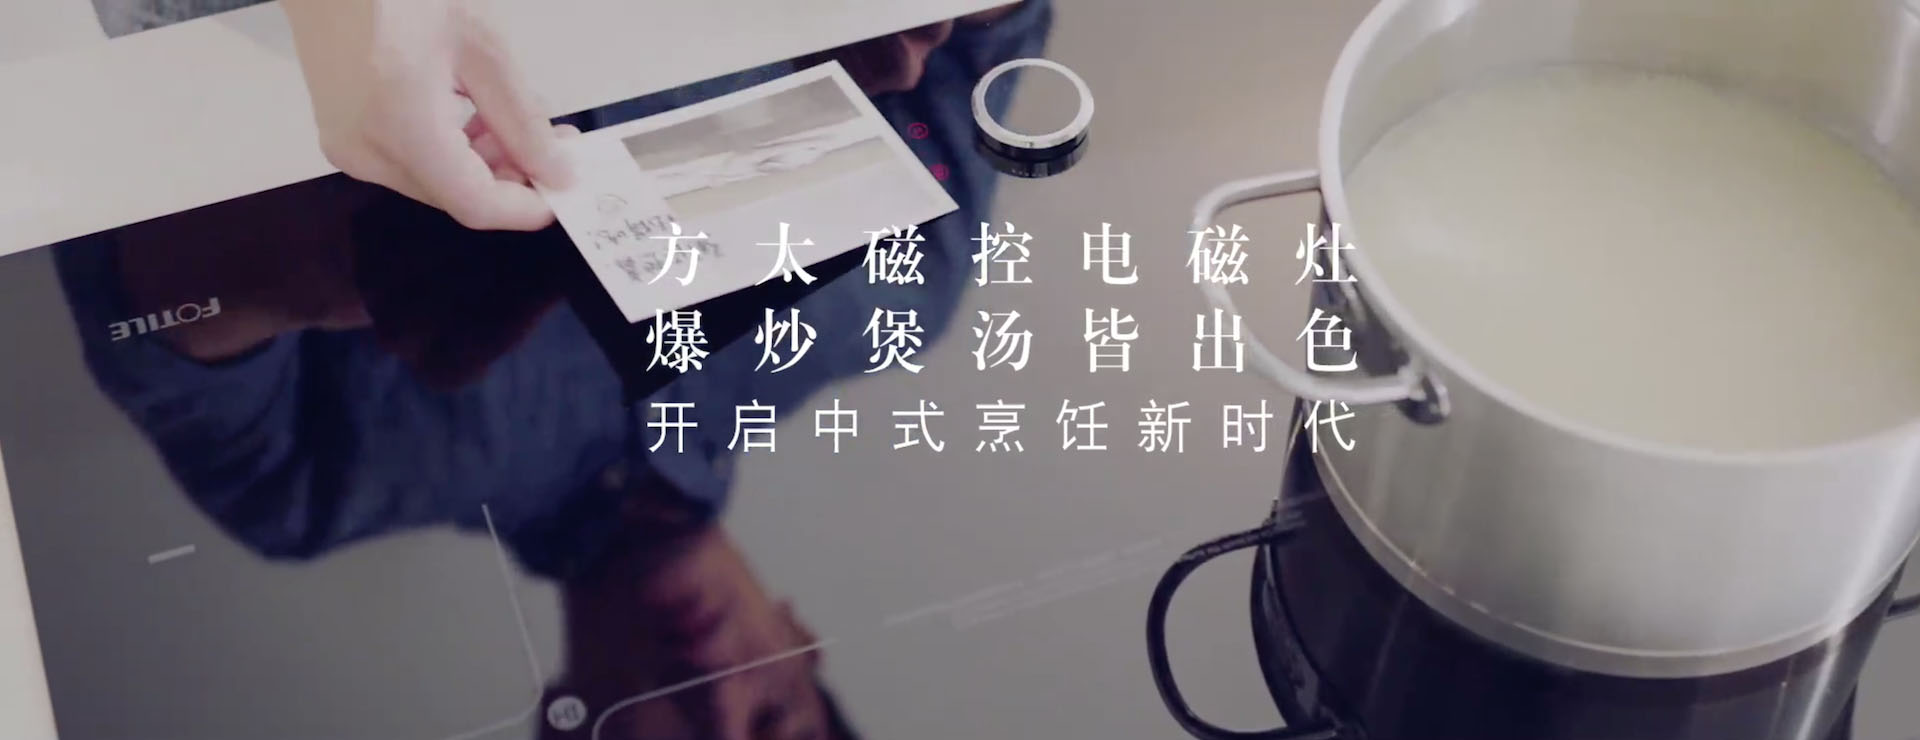 LadBrokes中文网磁控电磁灶